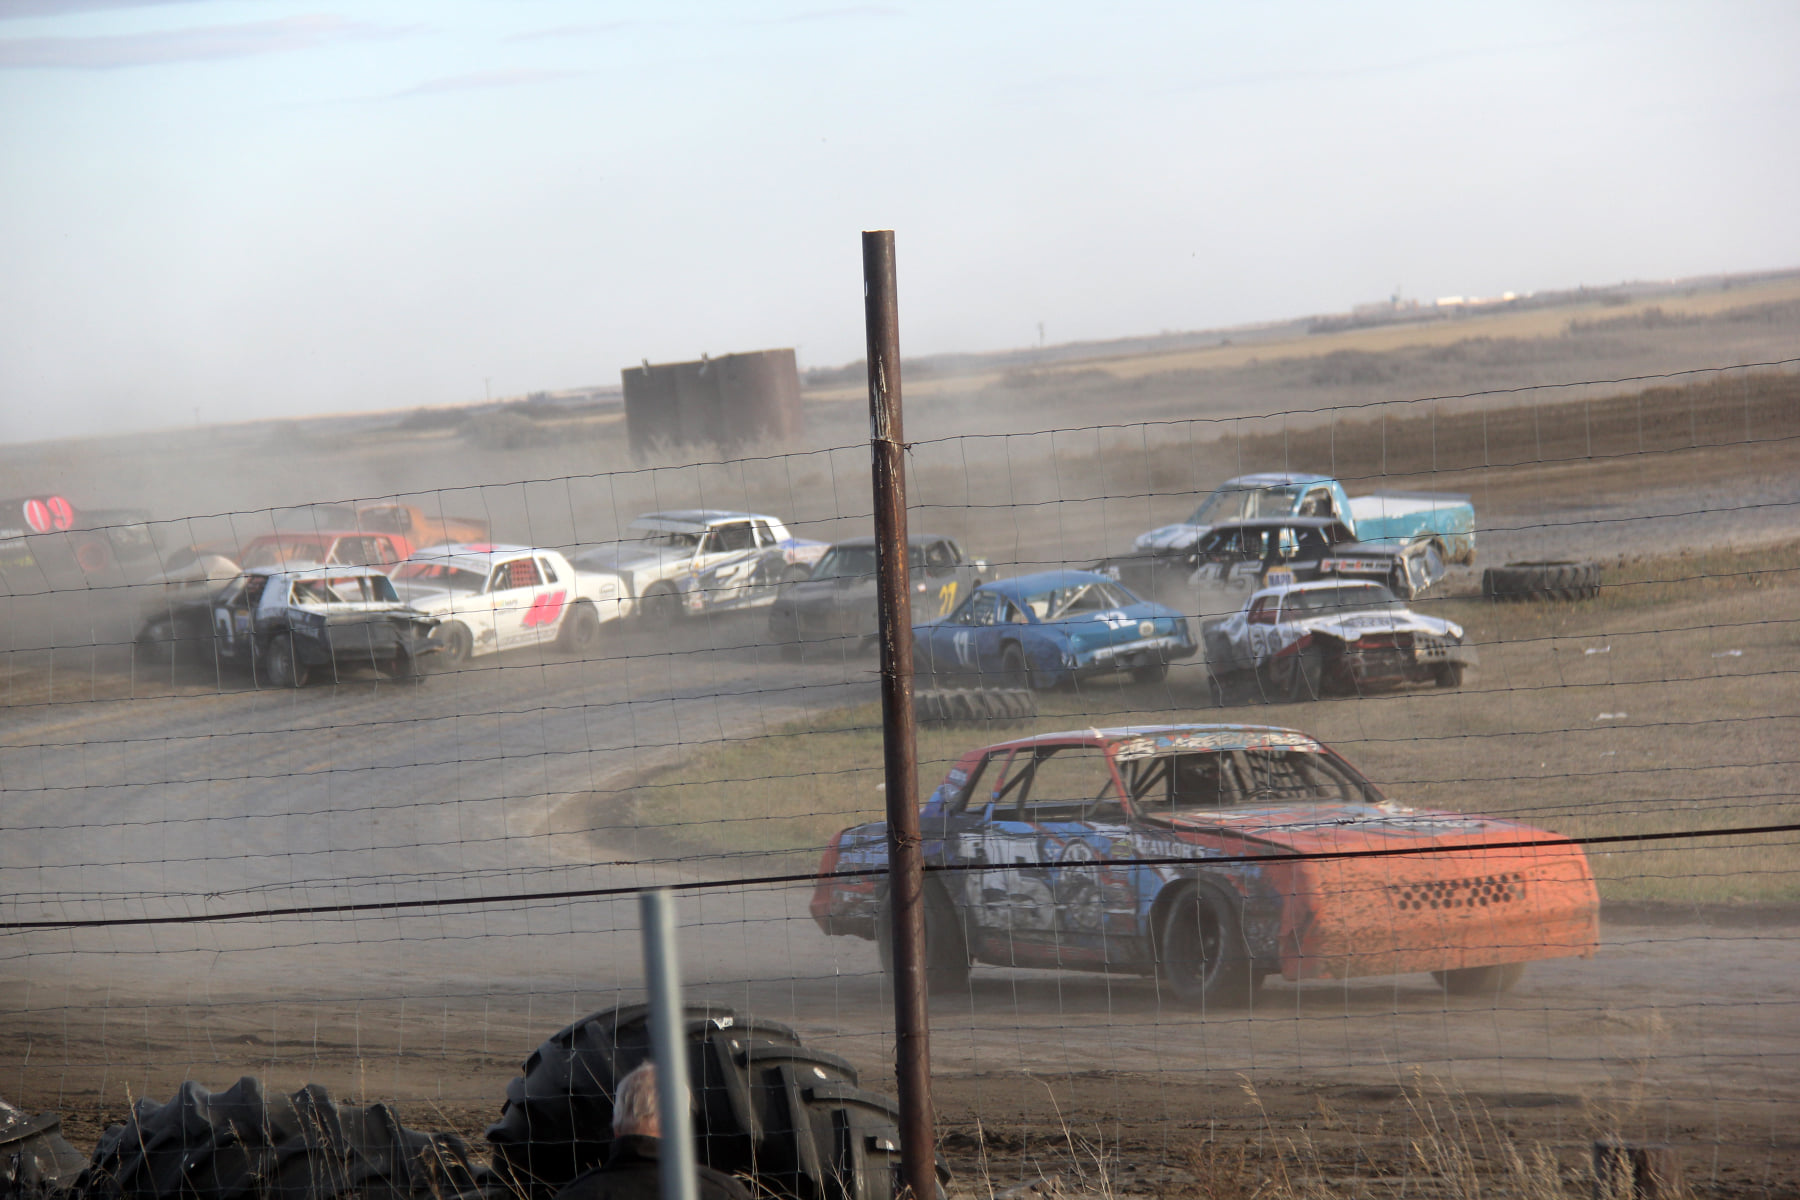 Outlook_Racing_Kemmer_Racing_Photography_18.jpg